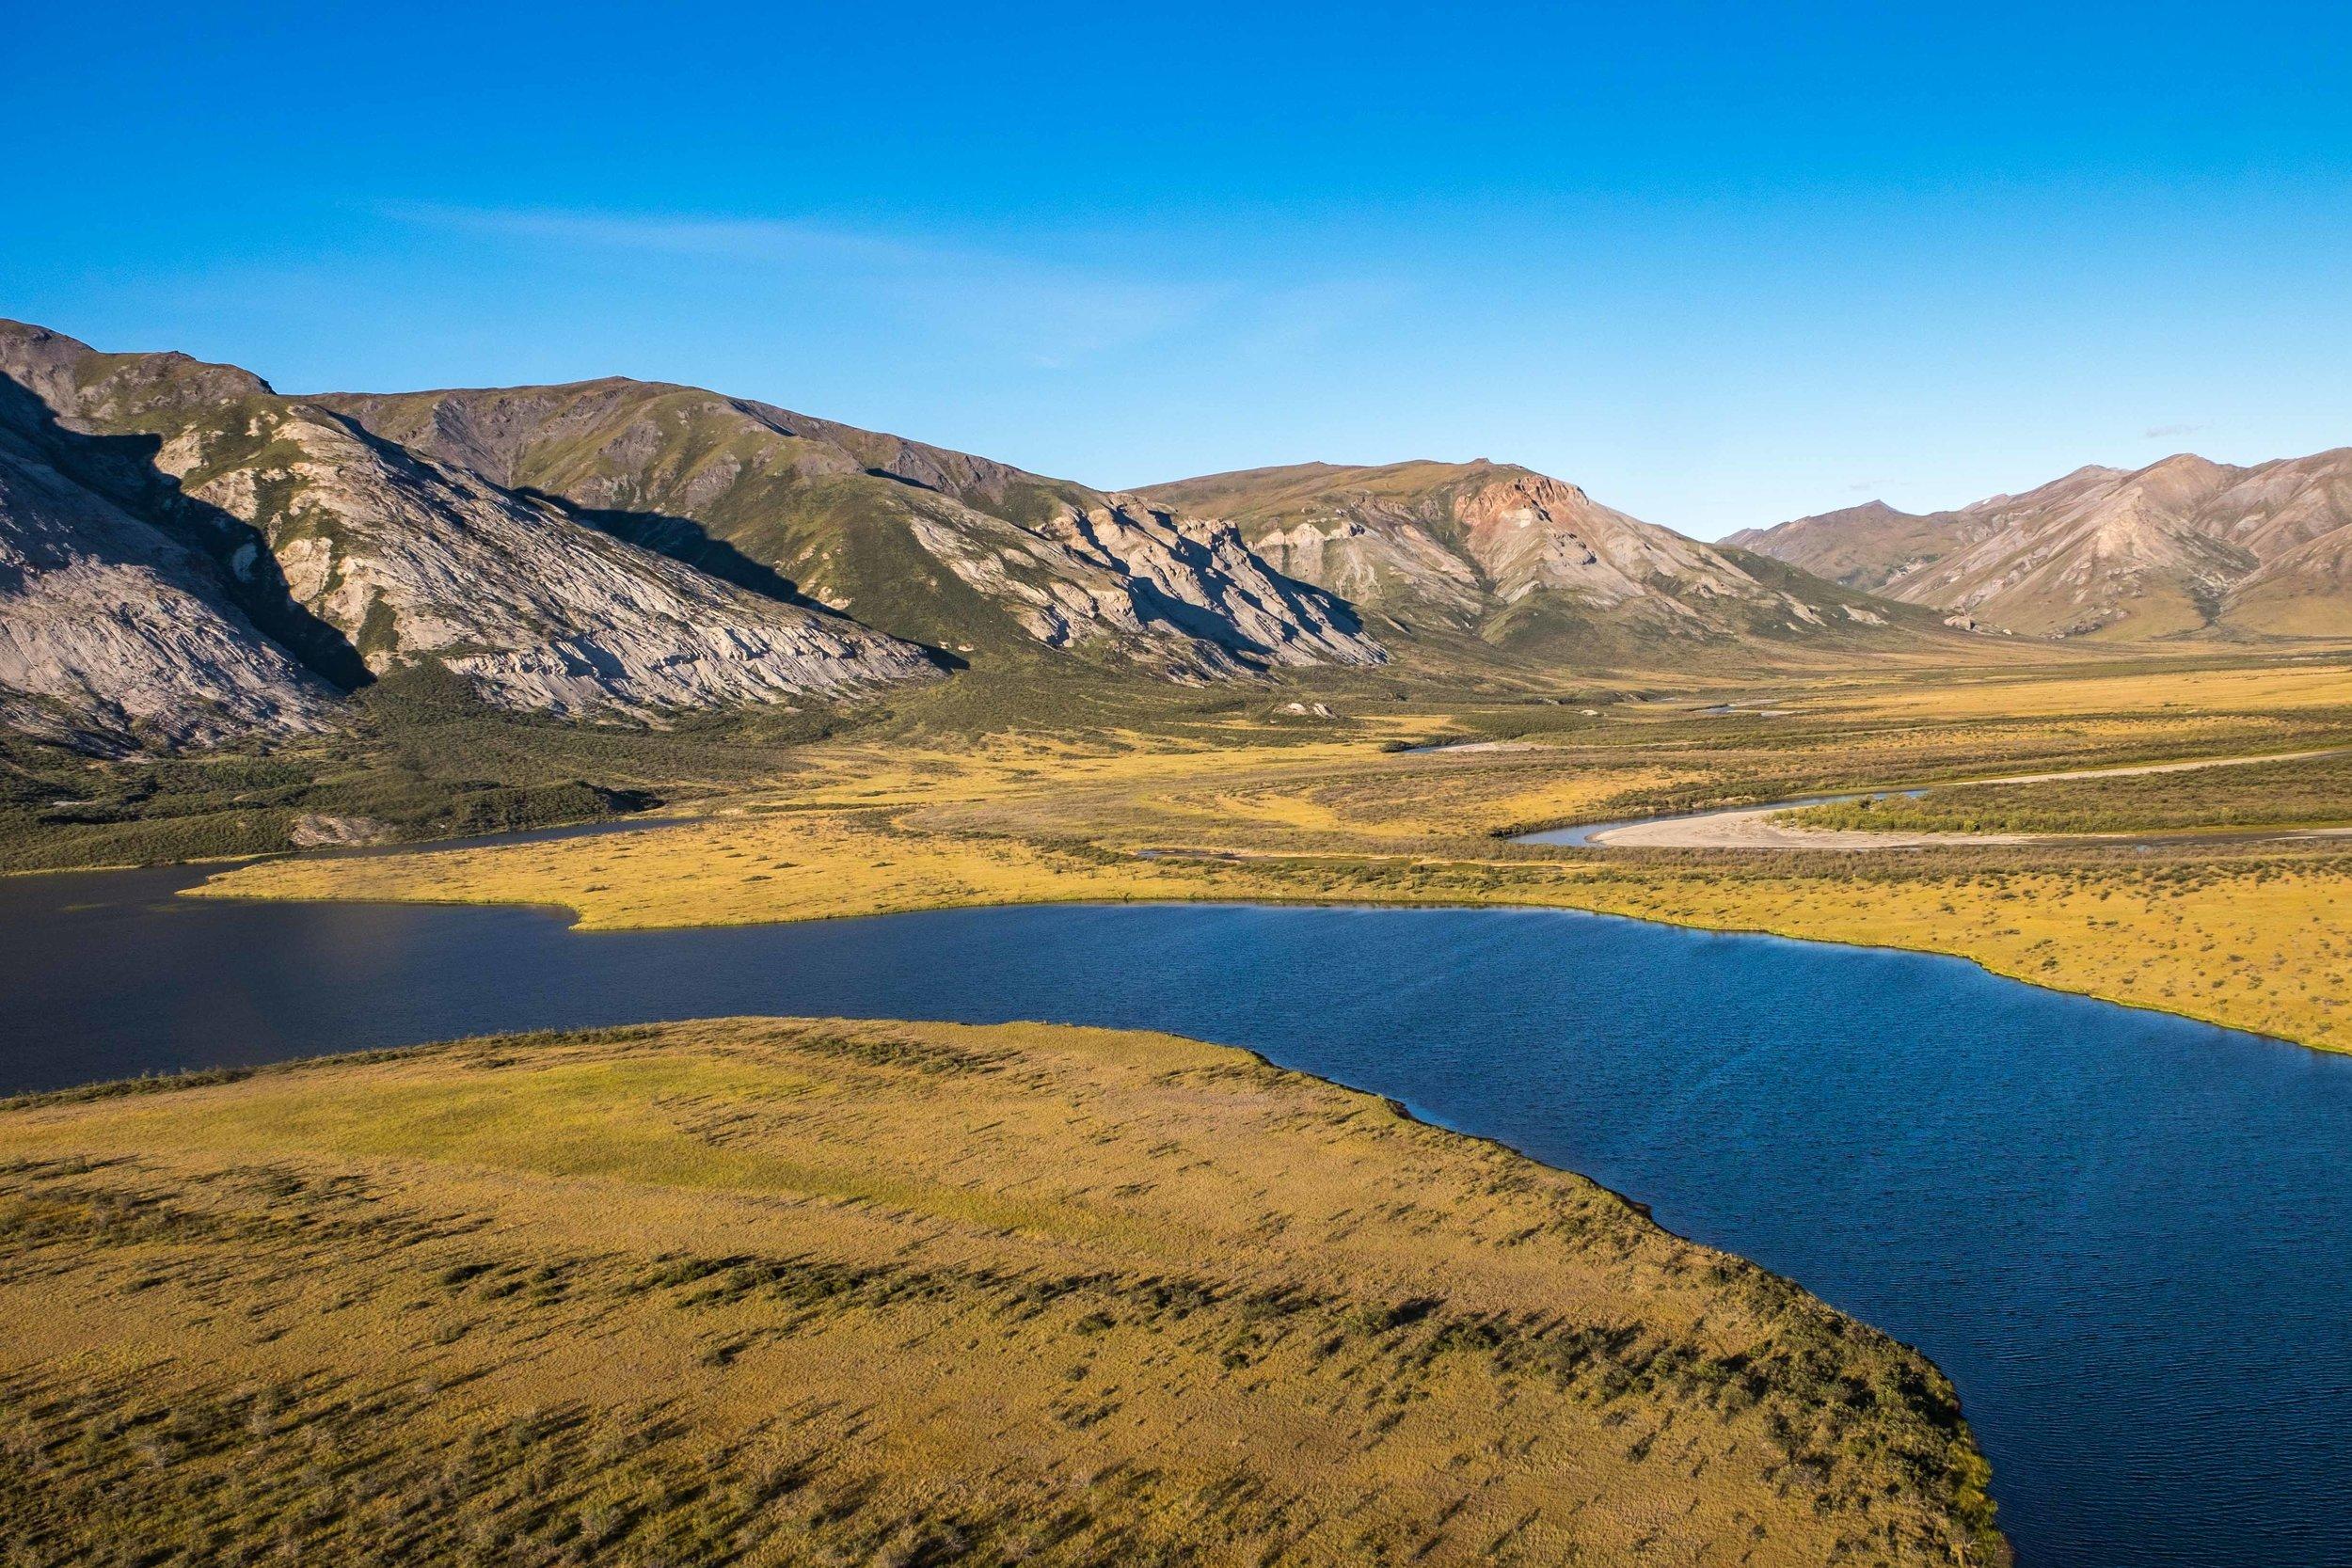 20160804-JI-Gates of the Arctic National Park-_DSF0343.jpg